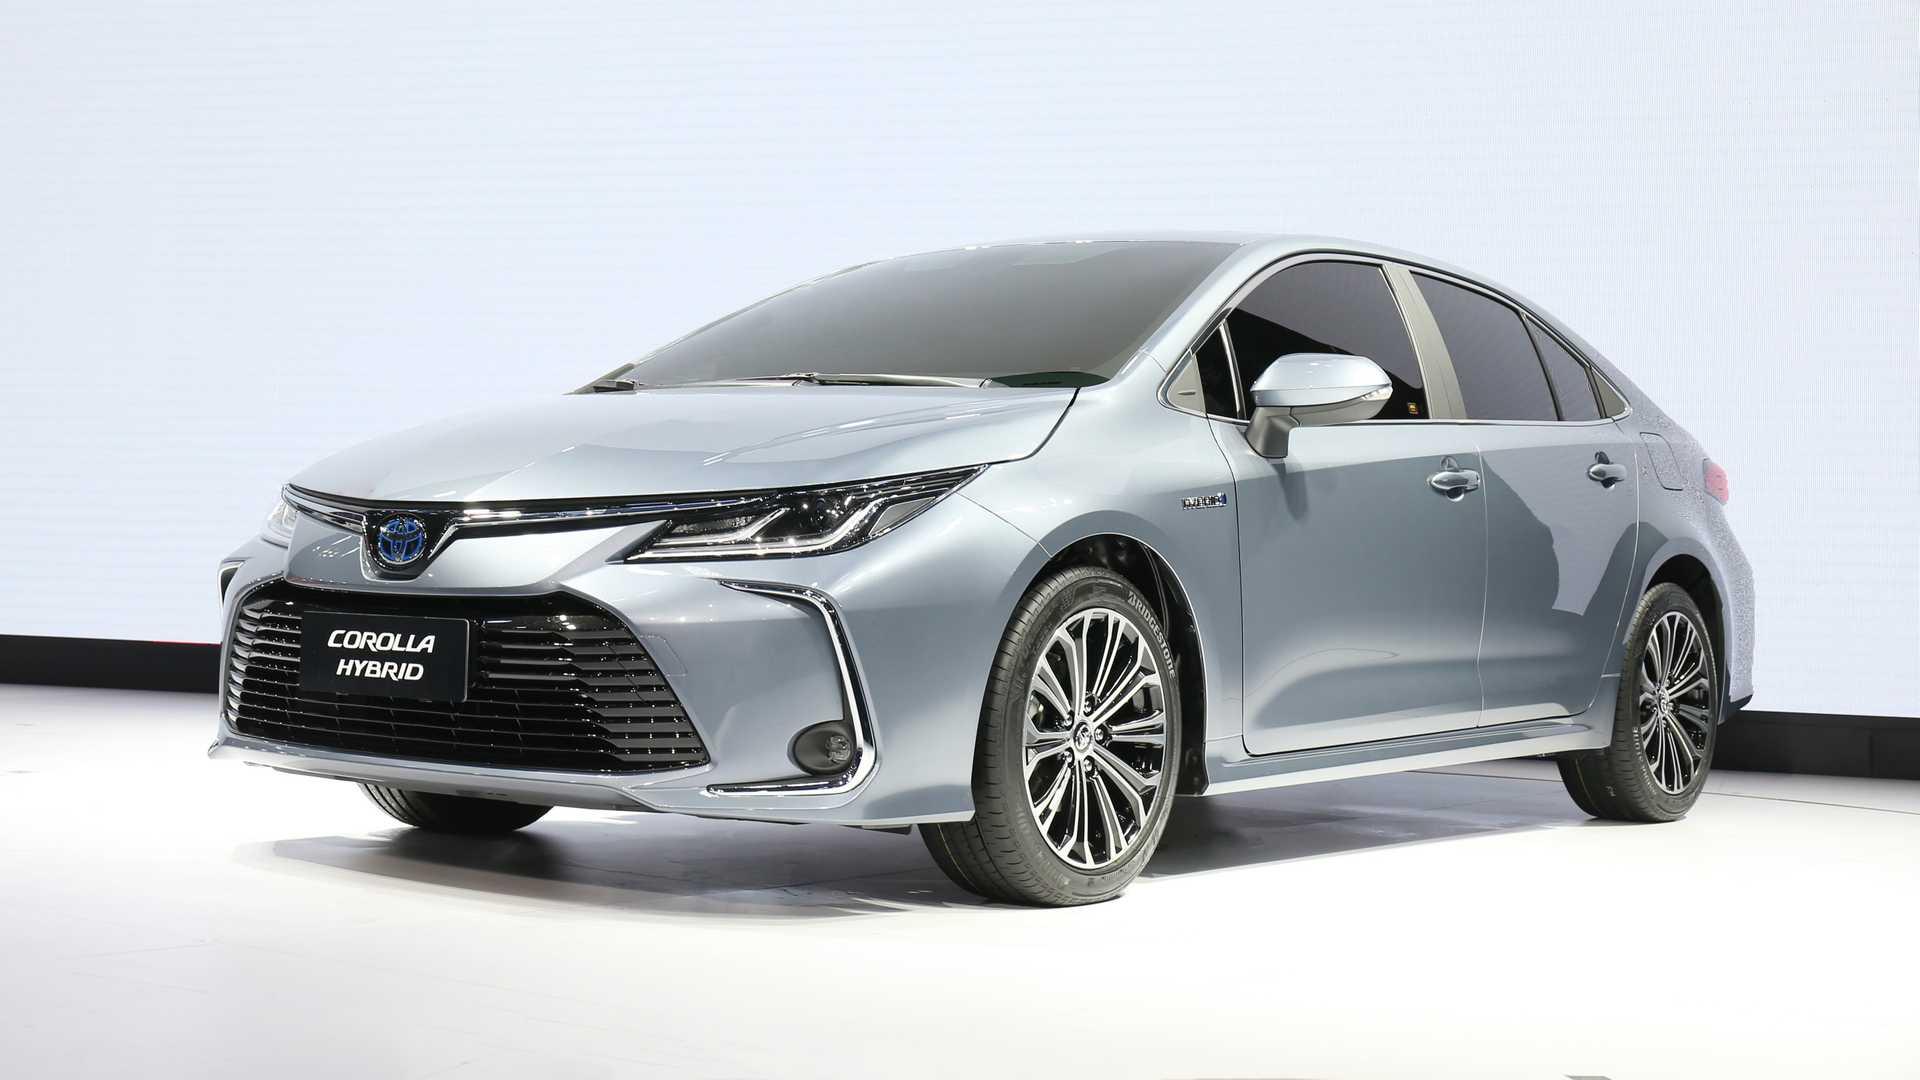 46 Great Toyota Corolla 2020 Redesign for Toyota Corolla 2020